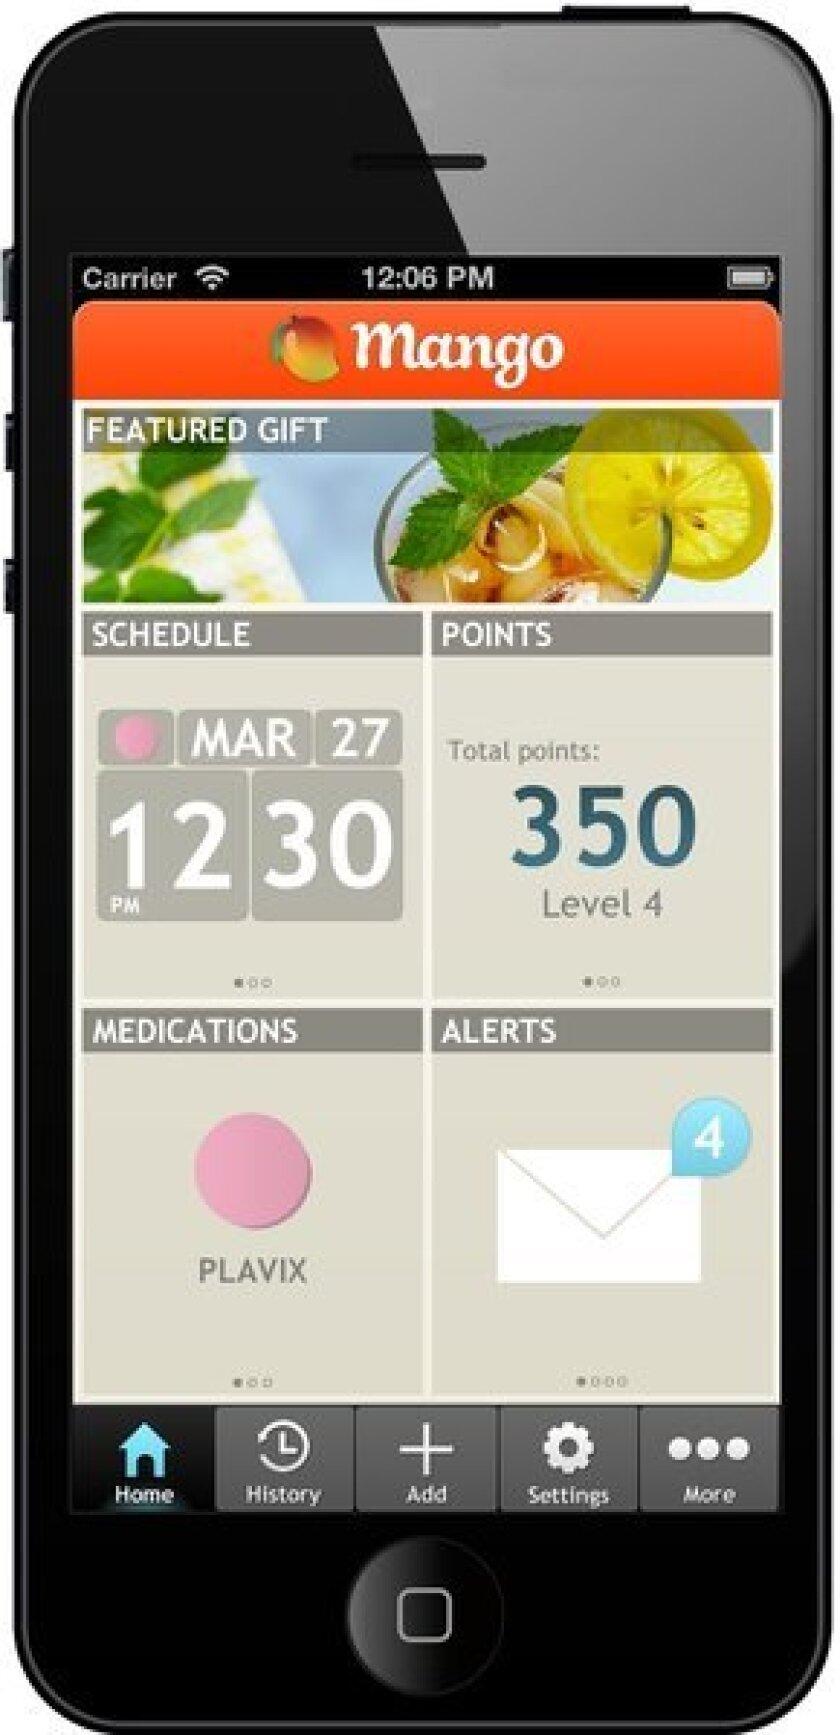 The Mango Health app home screen